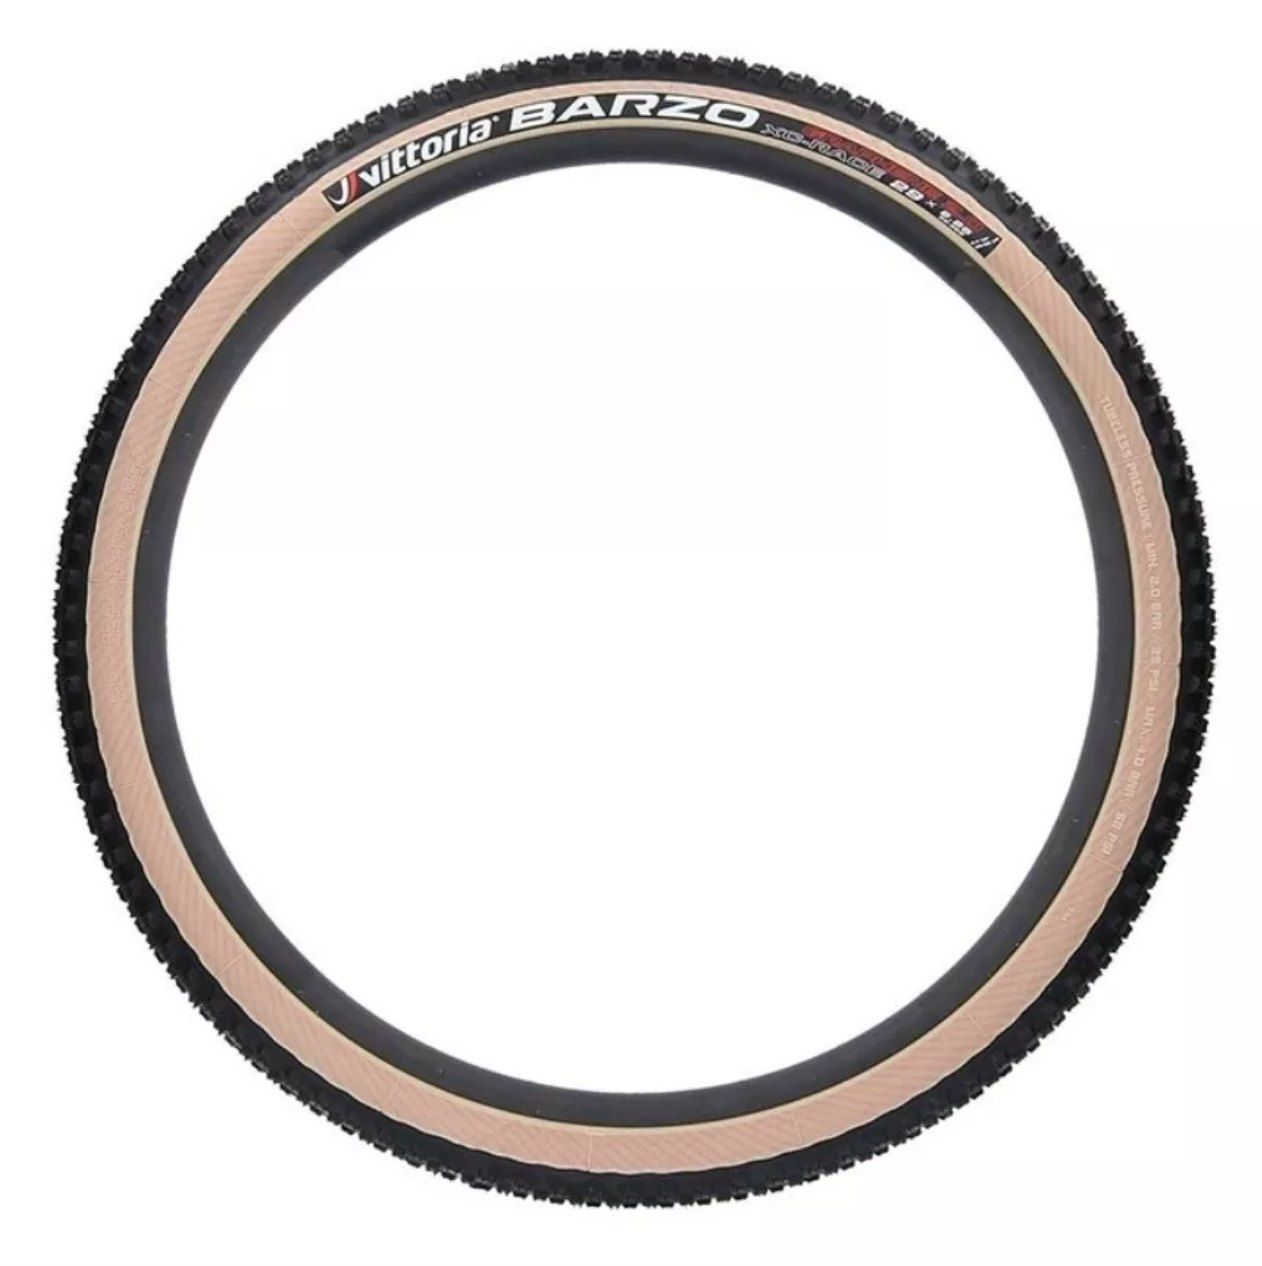 Pneu Vittoria Mezcal + Barzo 29x2.25 Grafeno 2.0 Xc Race Mtb